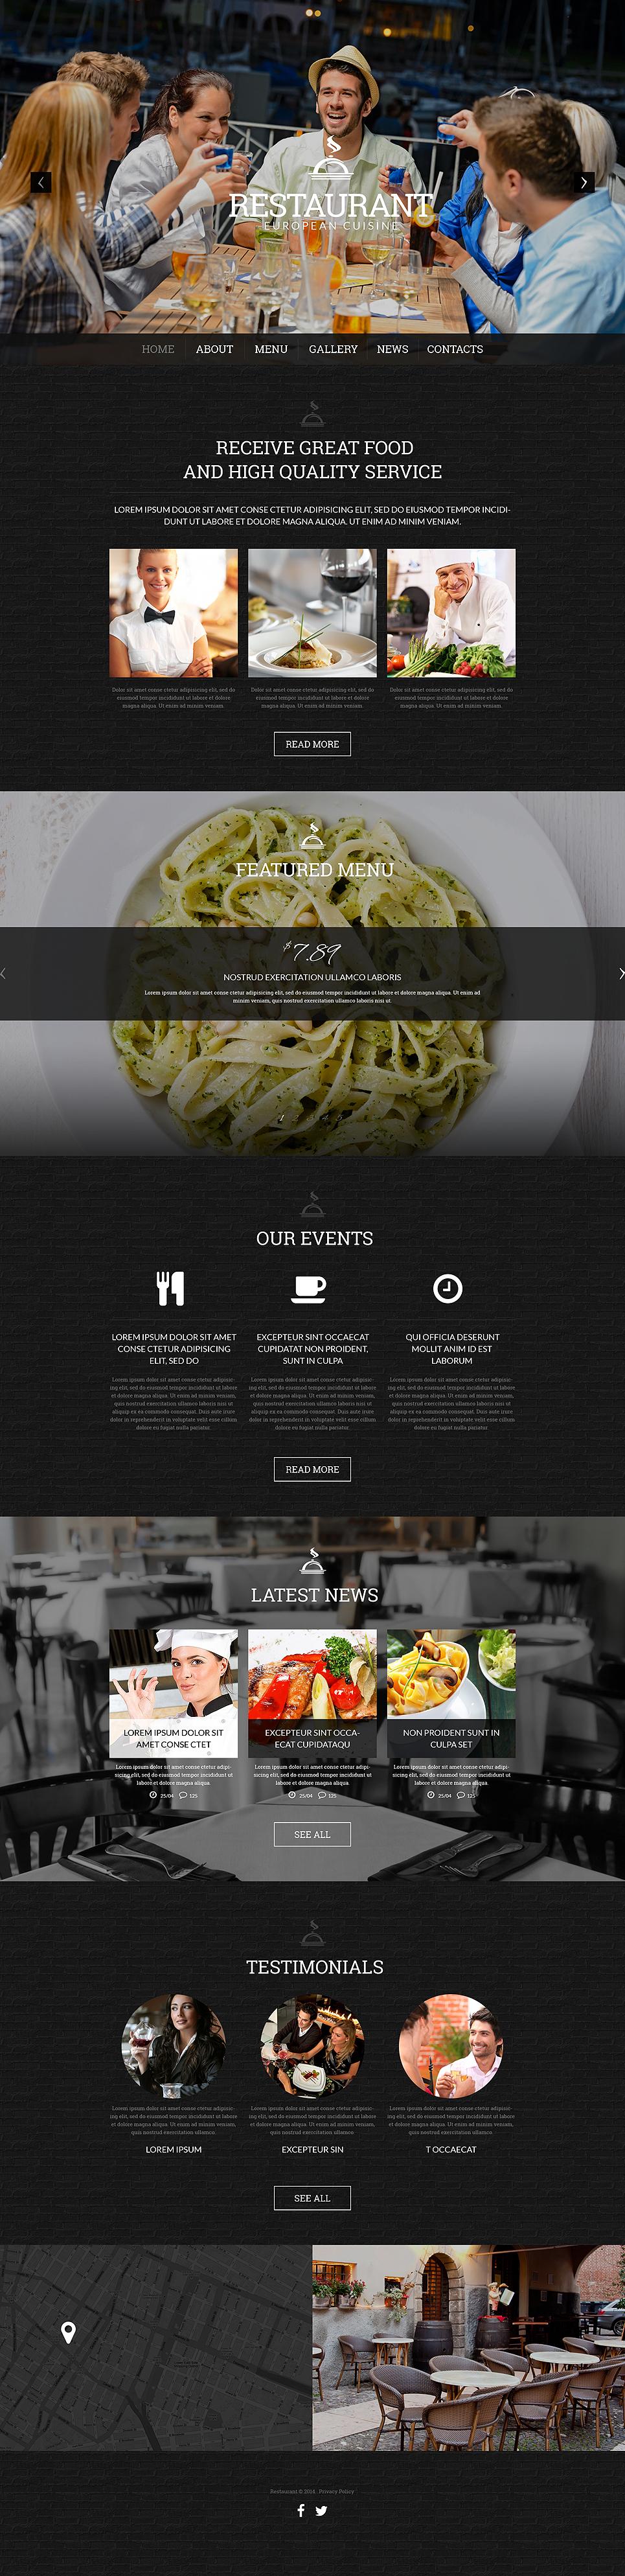 Адаптивный шаблон сайта на тему европейский ресторан #51323